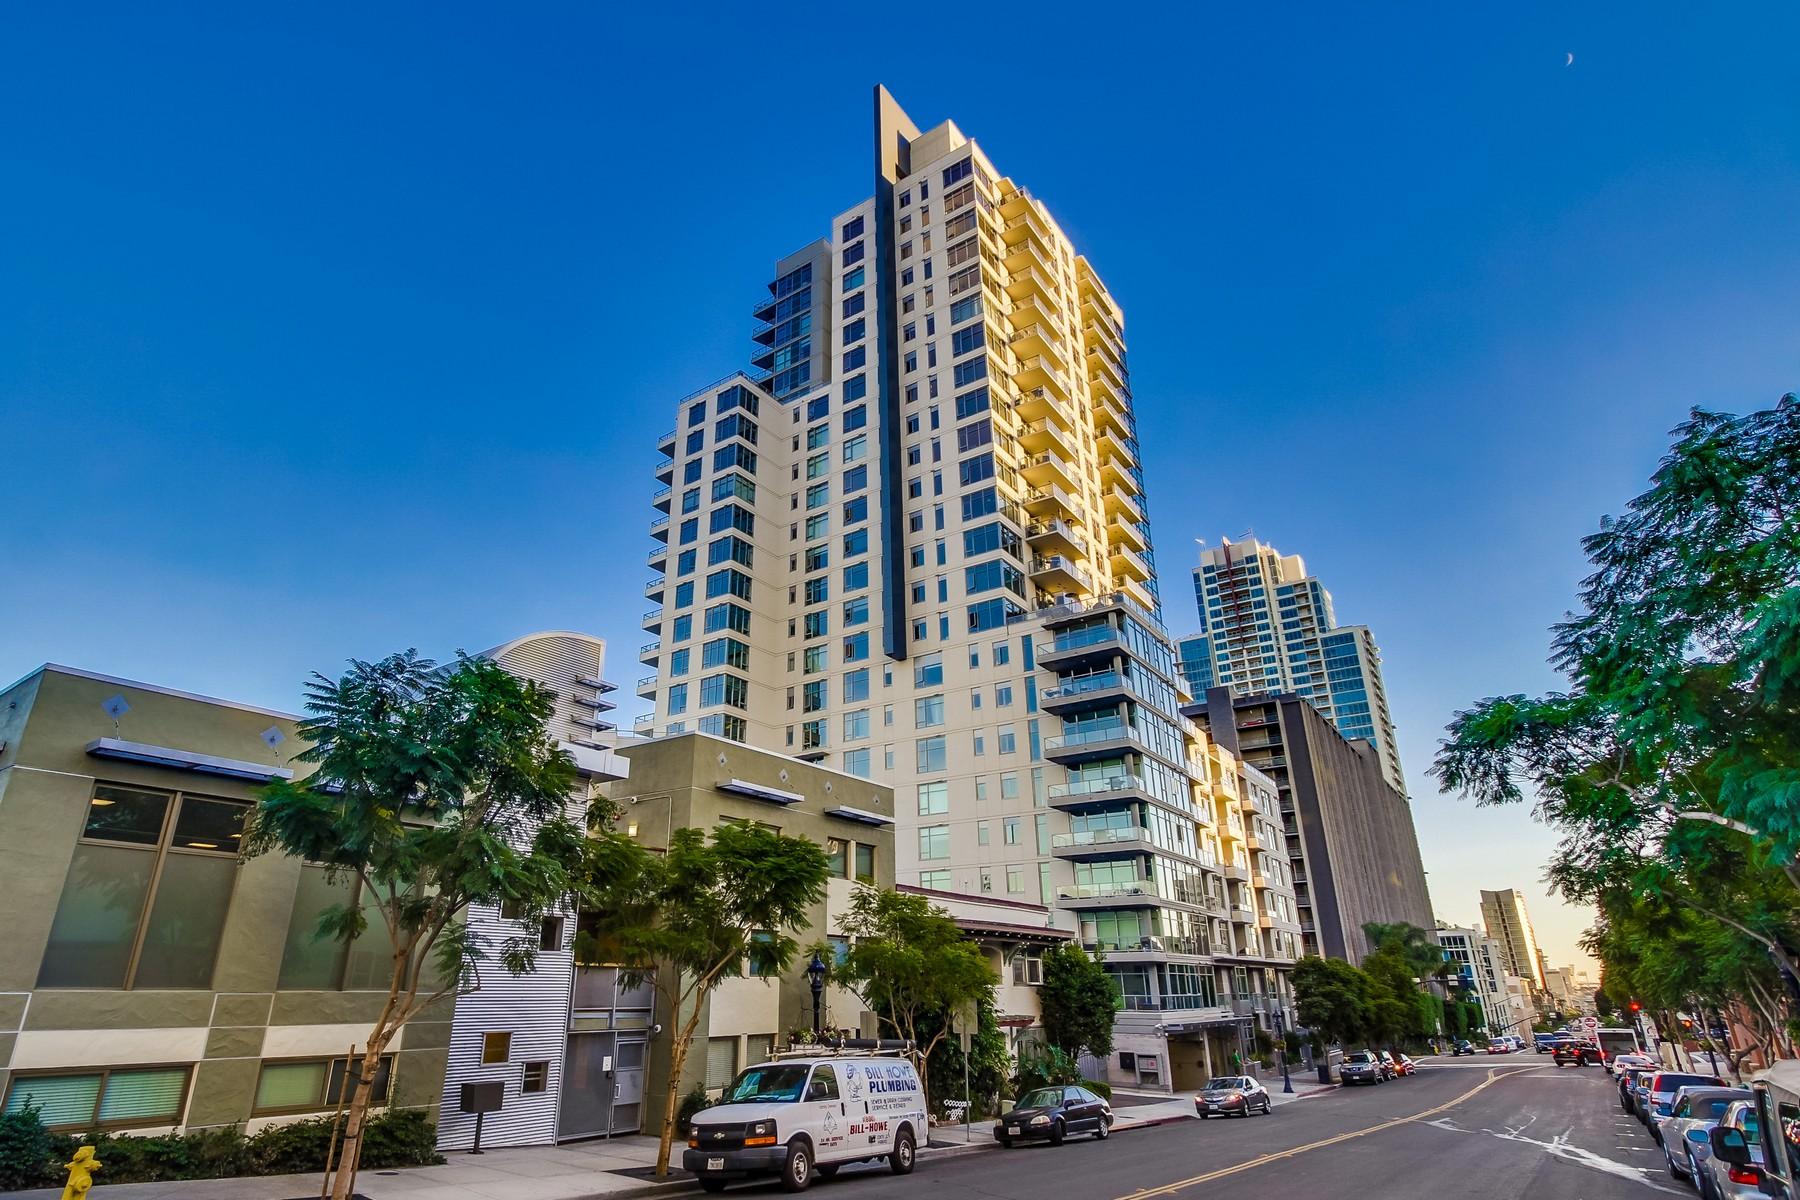 Additional photo for property listing at 1441 9th Avenue, 805  San Diego, California 92101 Estados Unidos